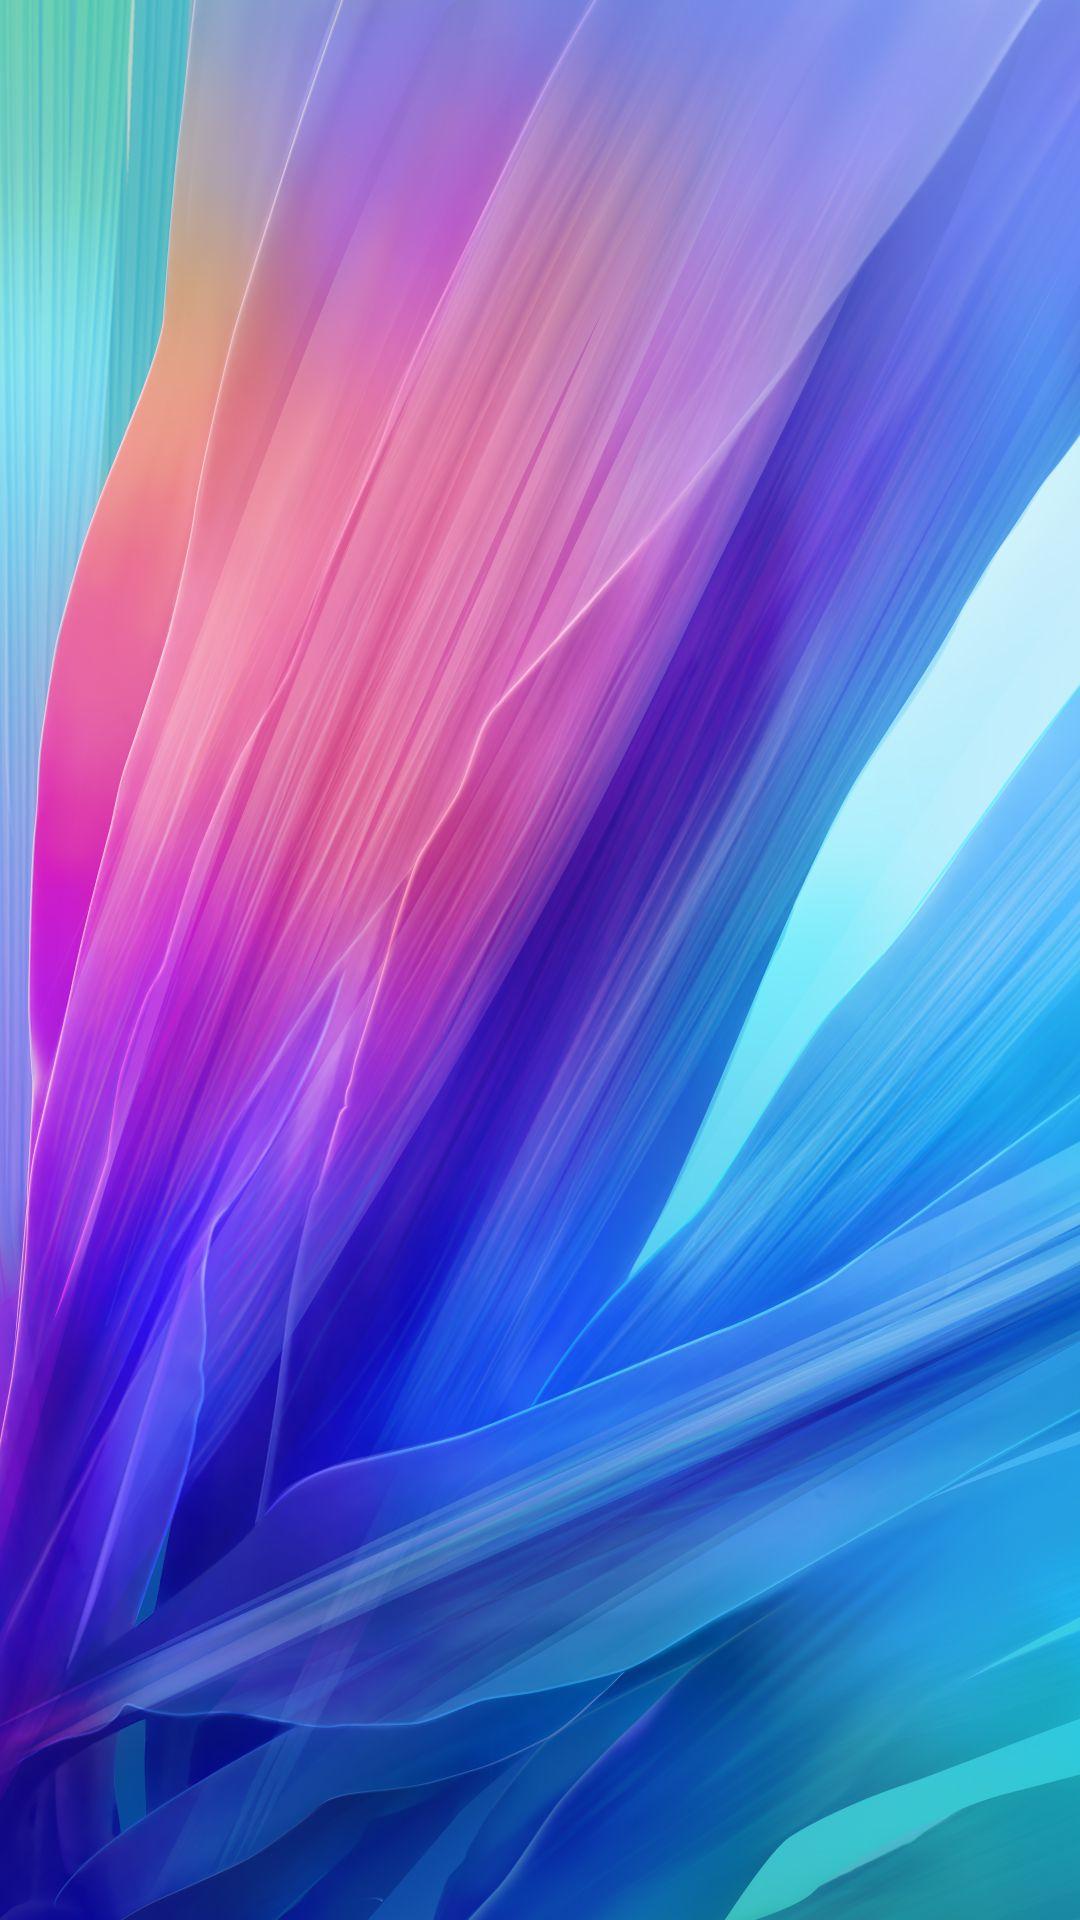 Wallpaper Iphone 7 Makemac   Apple 7 Plus Wallpaper Hd 357603 1080x1920